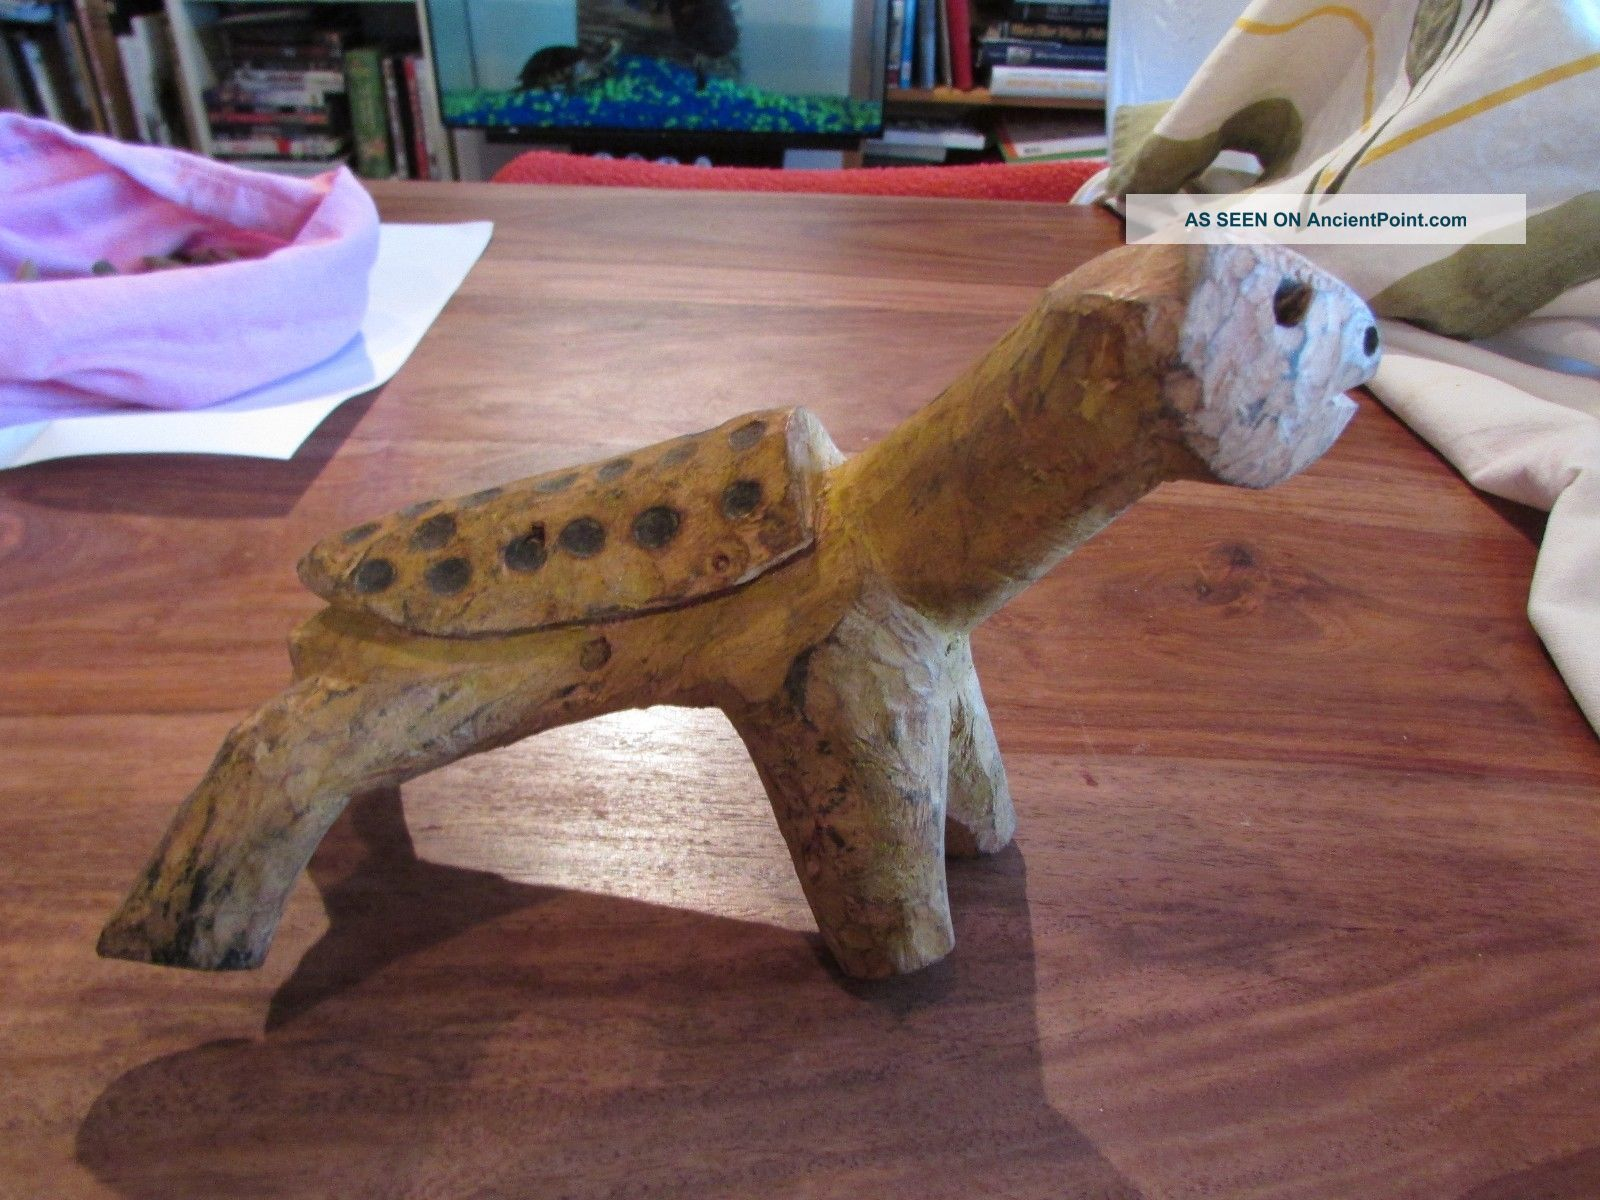 Turtle Wood Carved Small Animal Statue Samburu Archeps Post North Kenya Sculptures & Statues photo